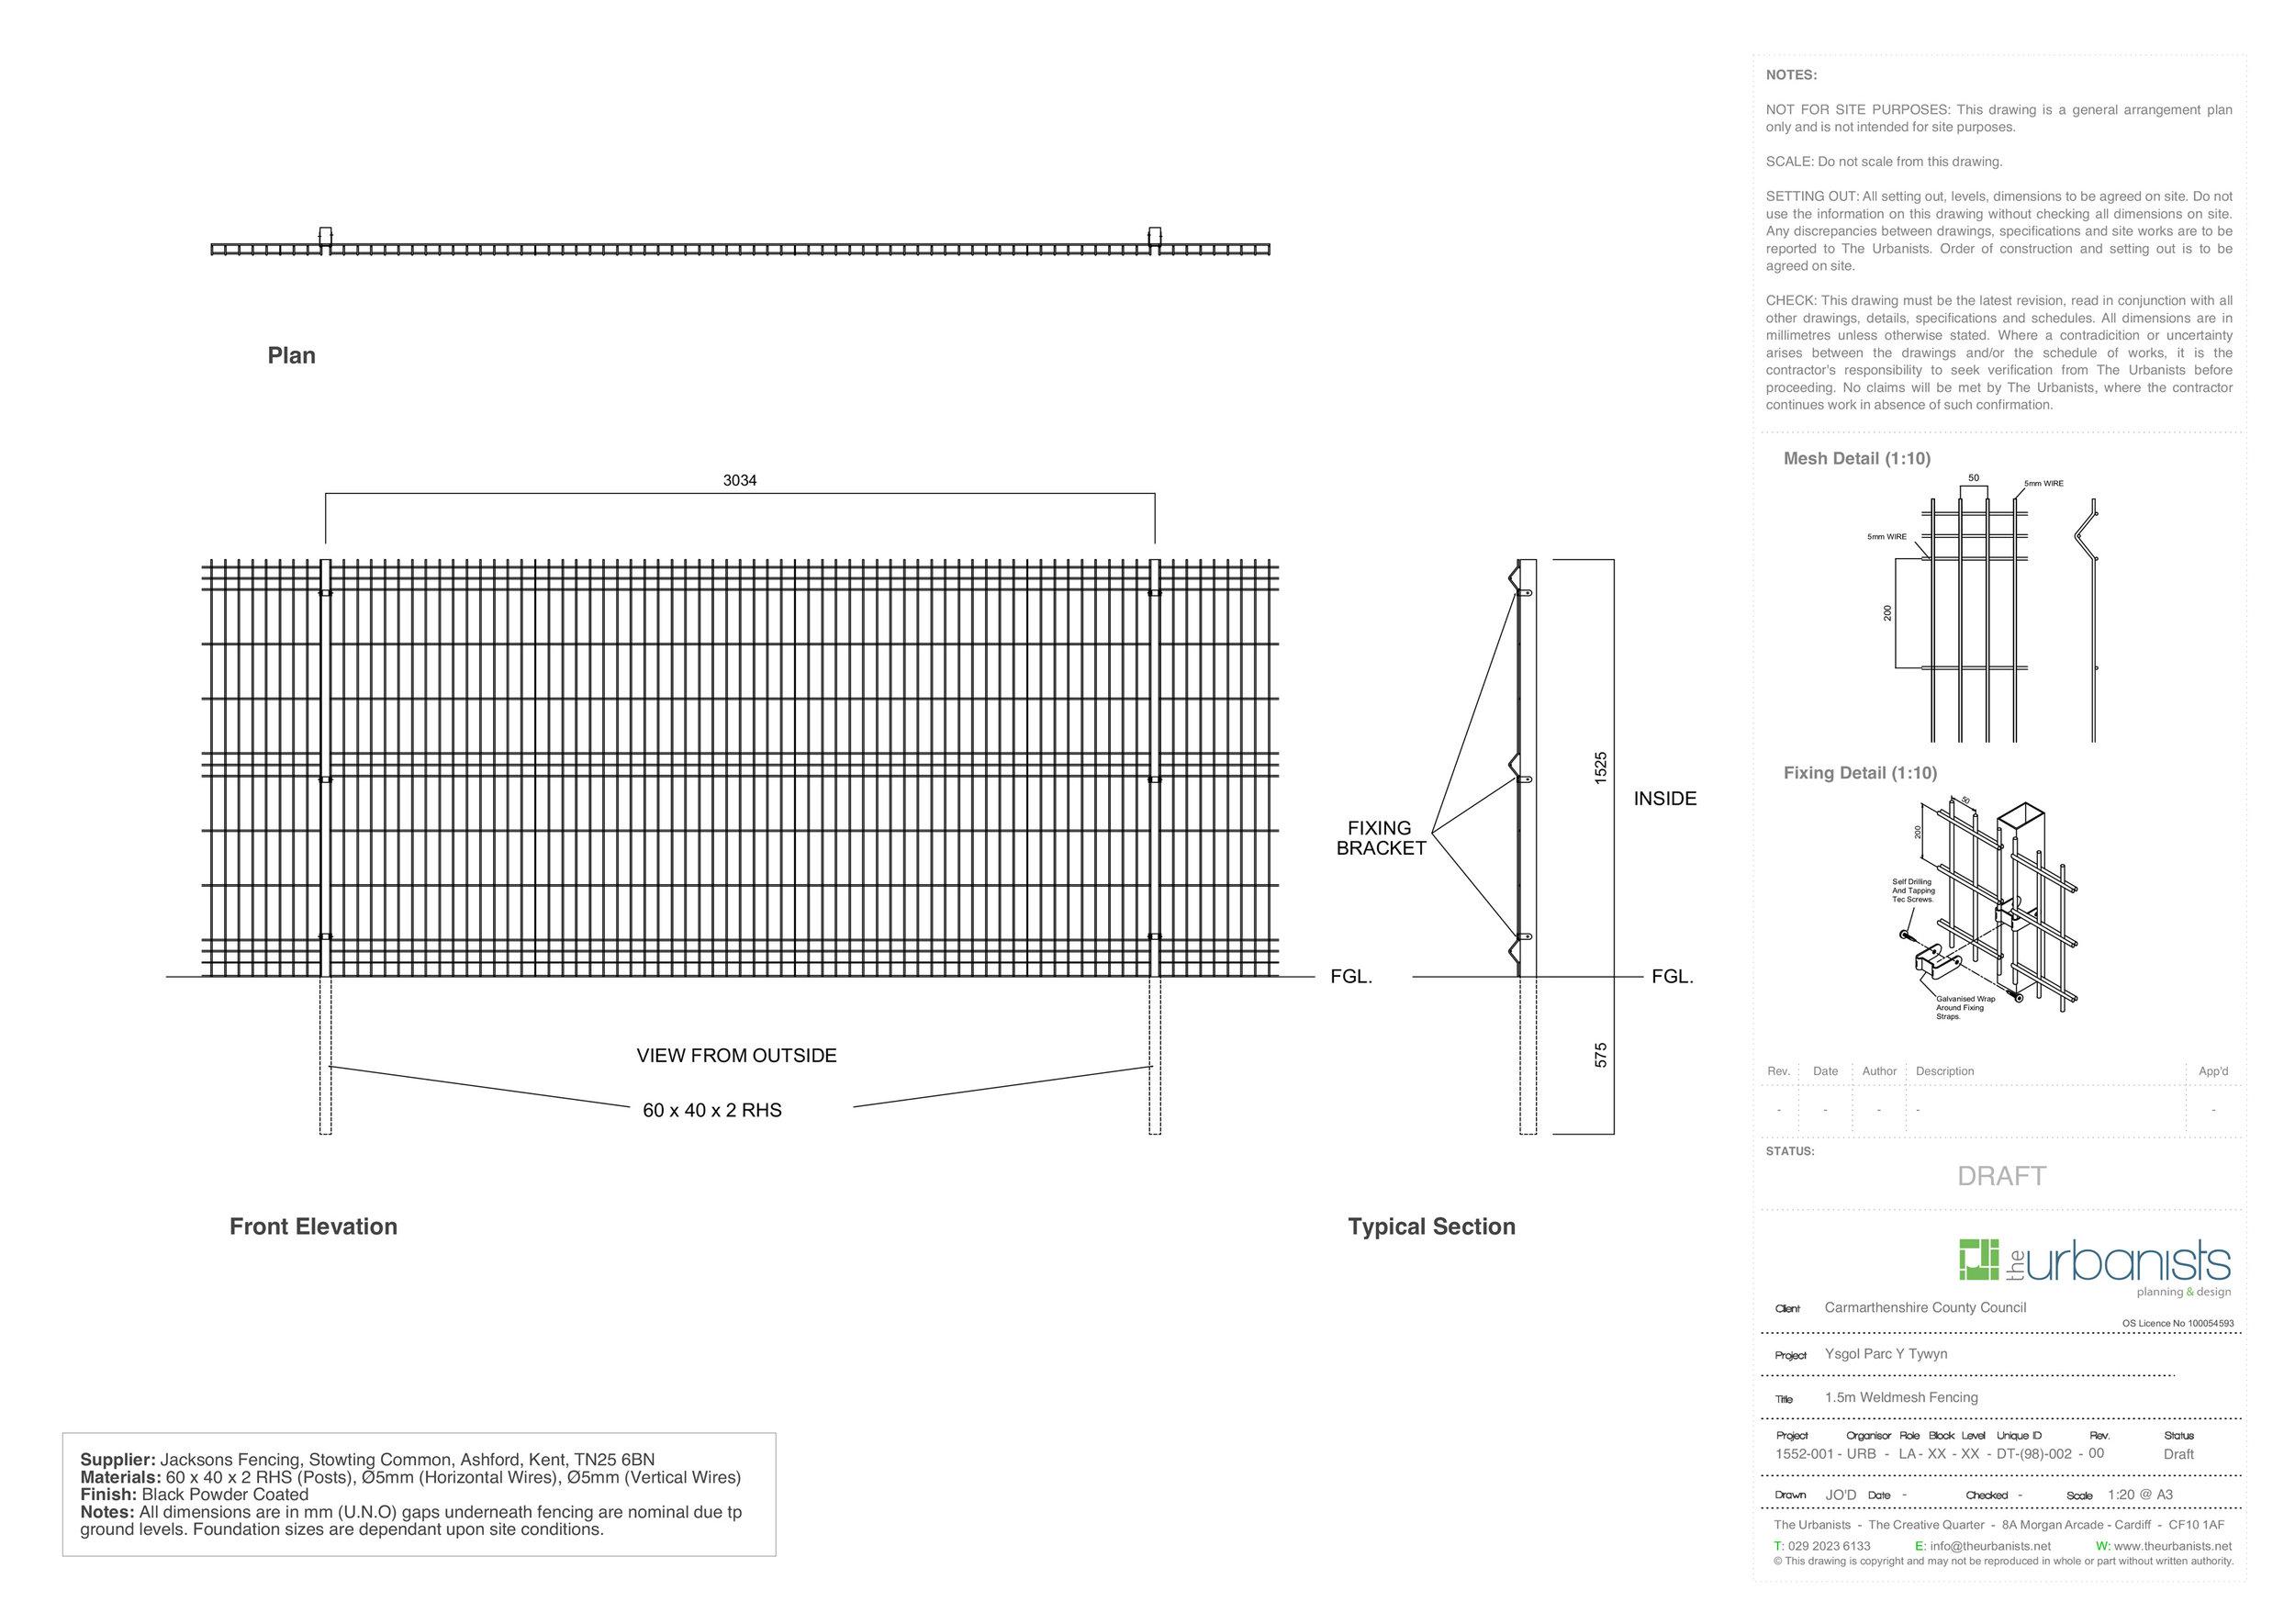 151218-DT-(98)-002-(DRAFT).jpg